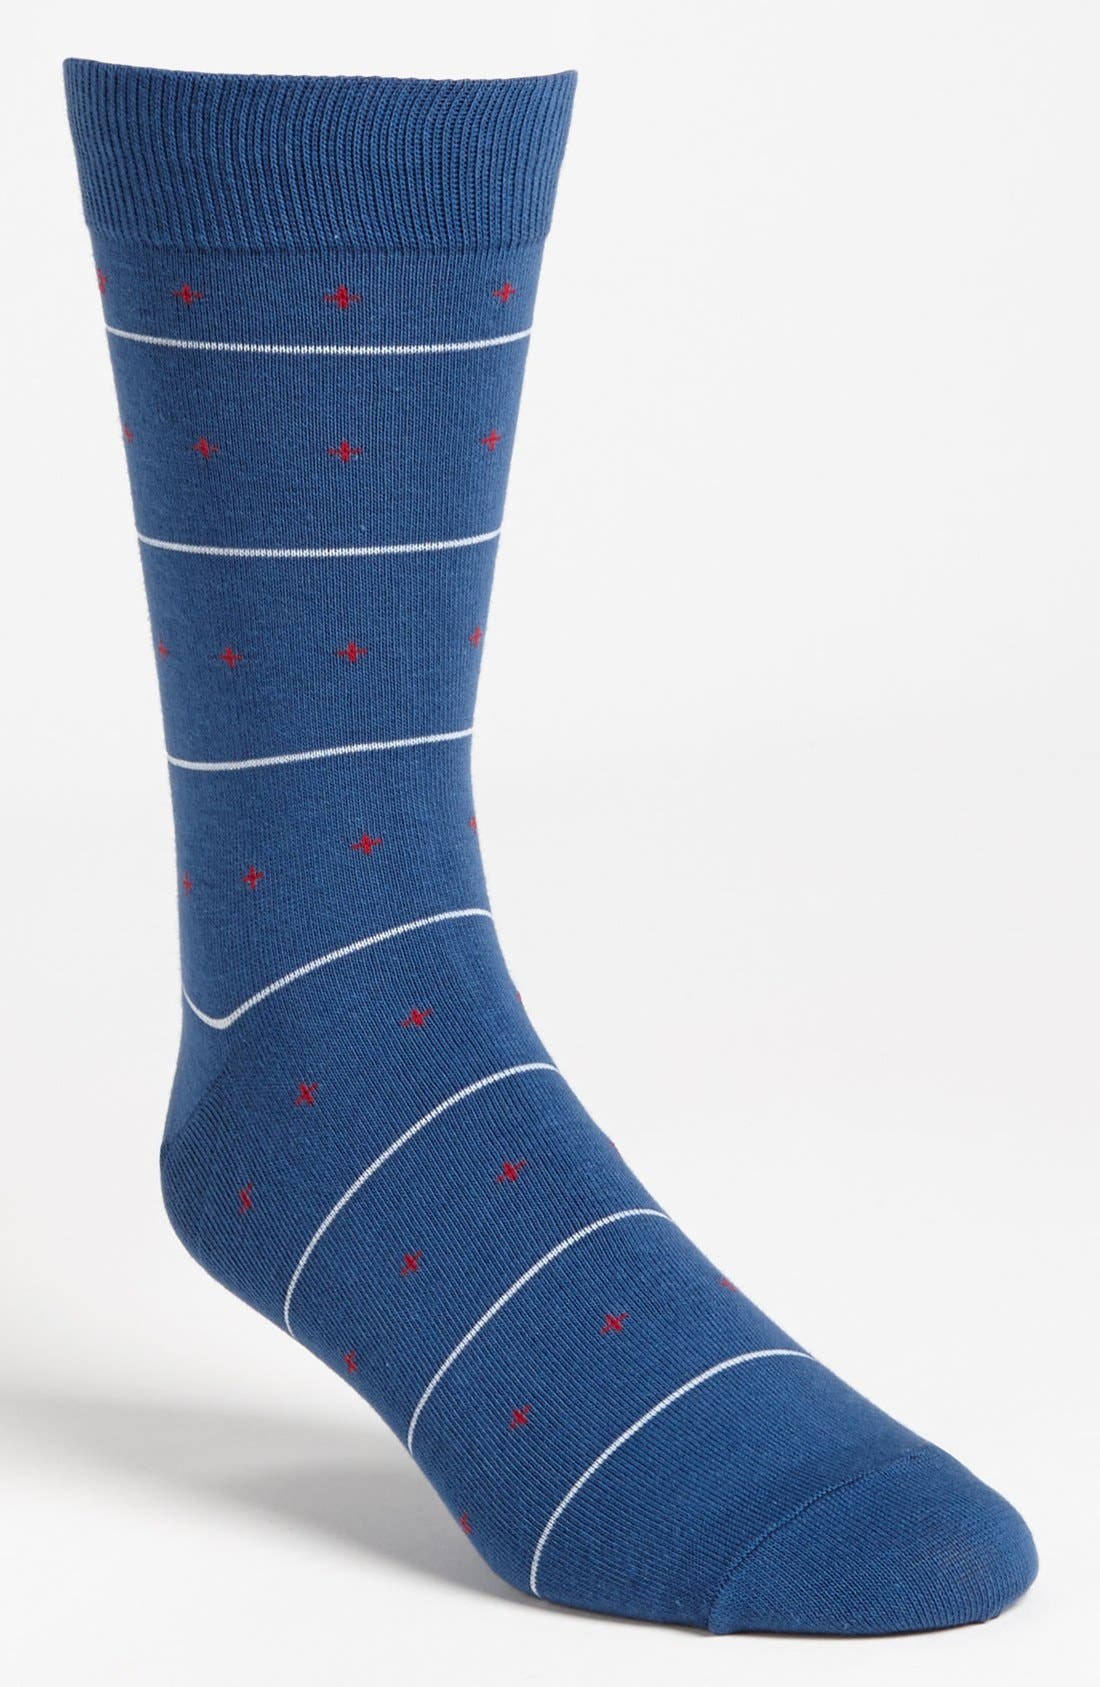 Main Image - Richer Poorer 'Tourist' Socks